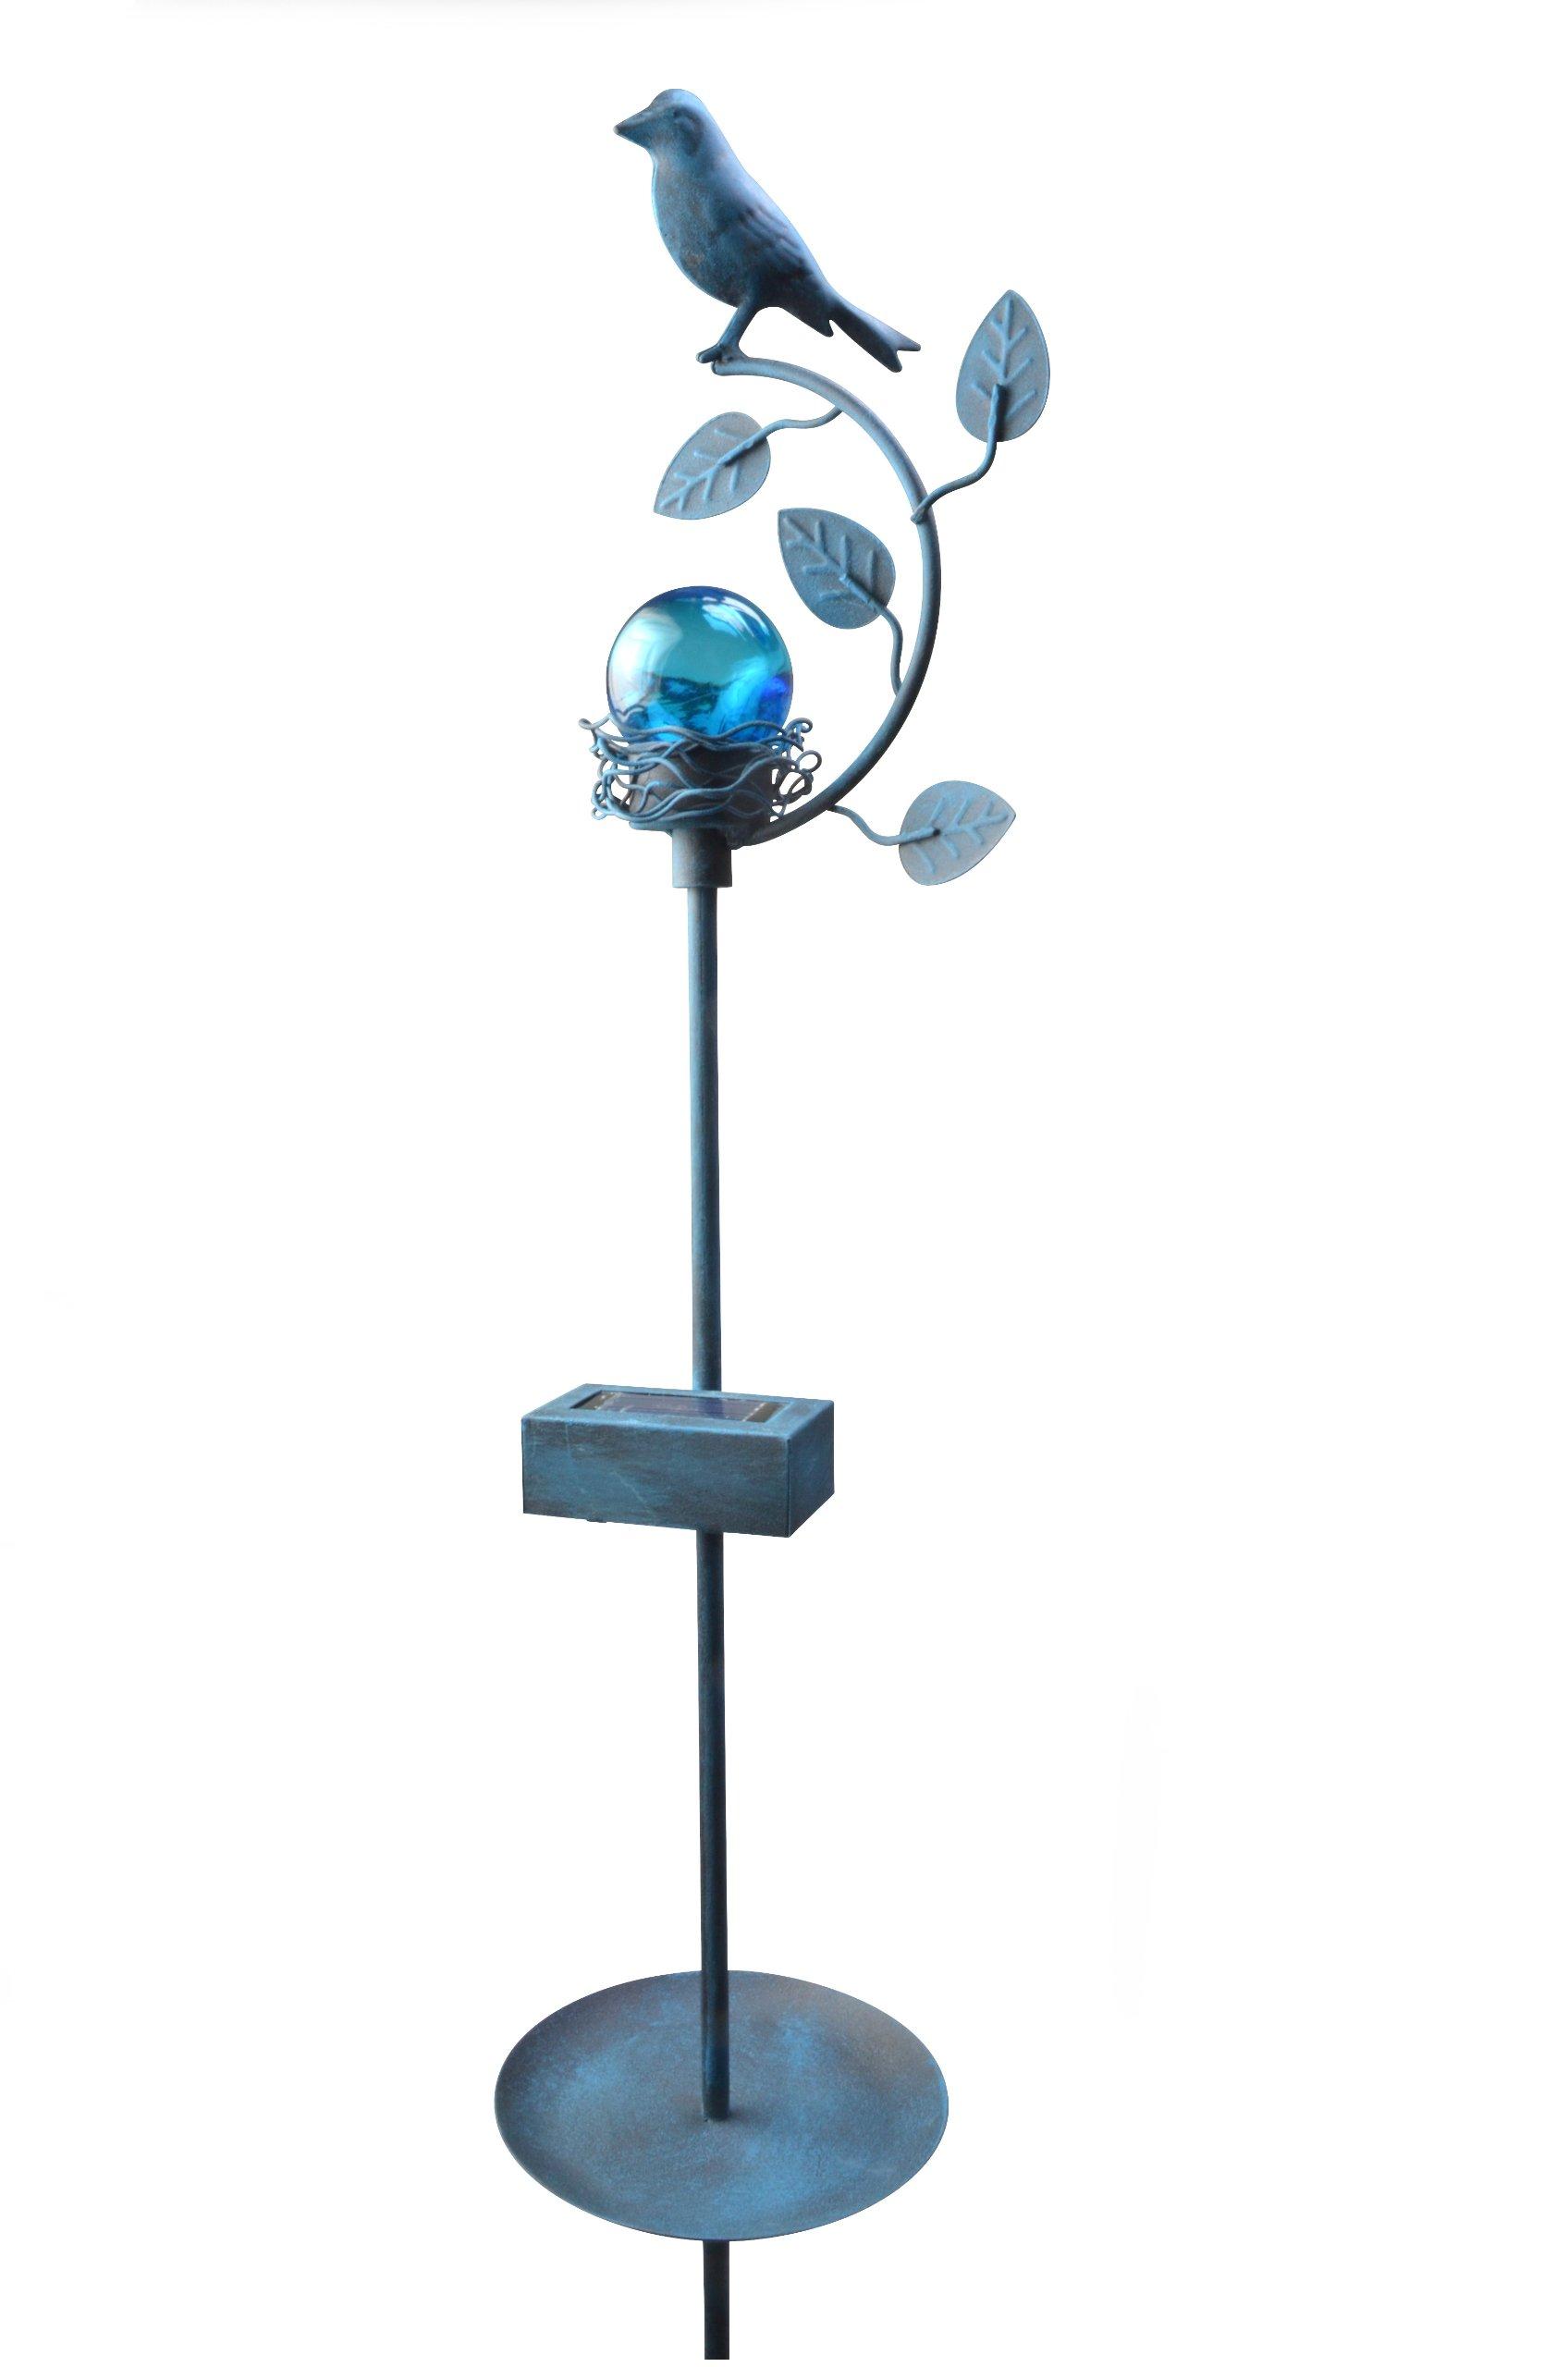 Moonrays 92575 Solar-Powered Backyard Bird Brighter LED Metal Stake Light by Moonrays (Image #1)